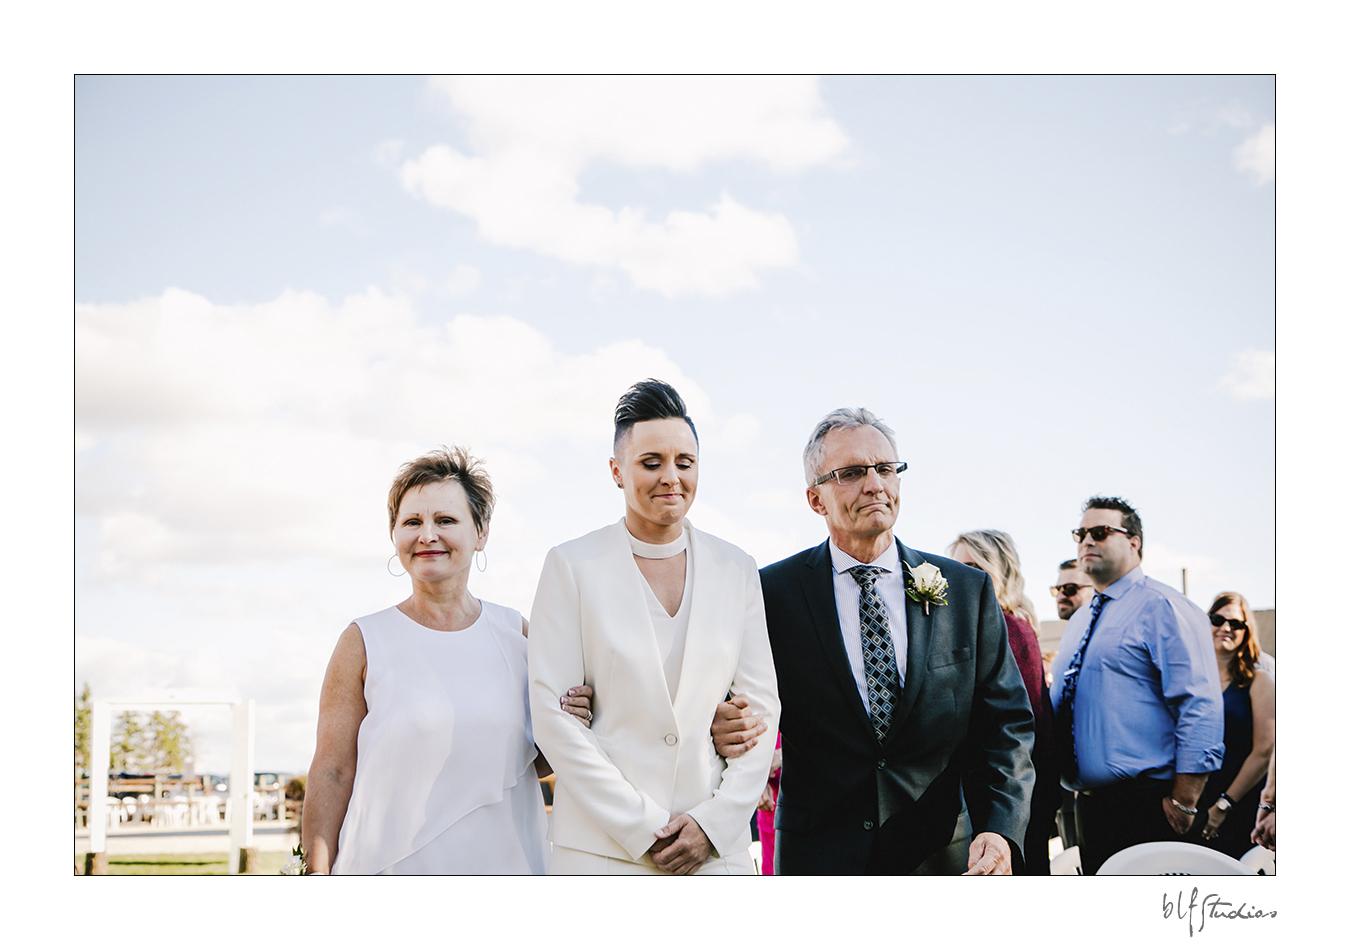 025-winnipeg-hitchnpost-wedding-marla-alana.jpg